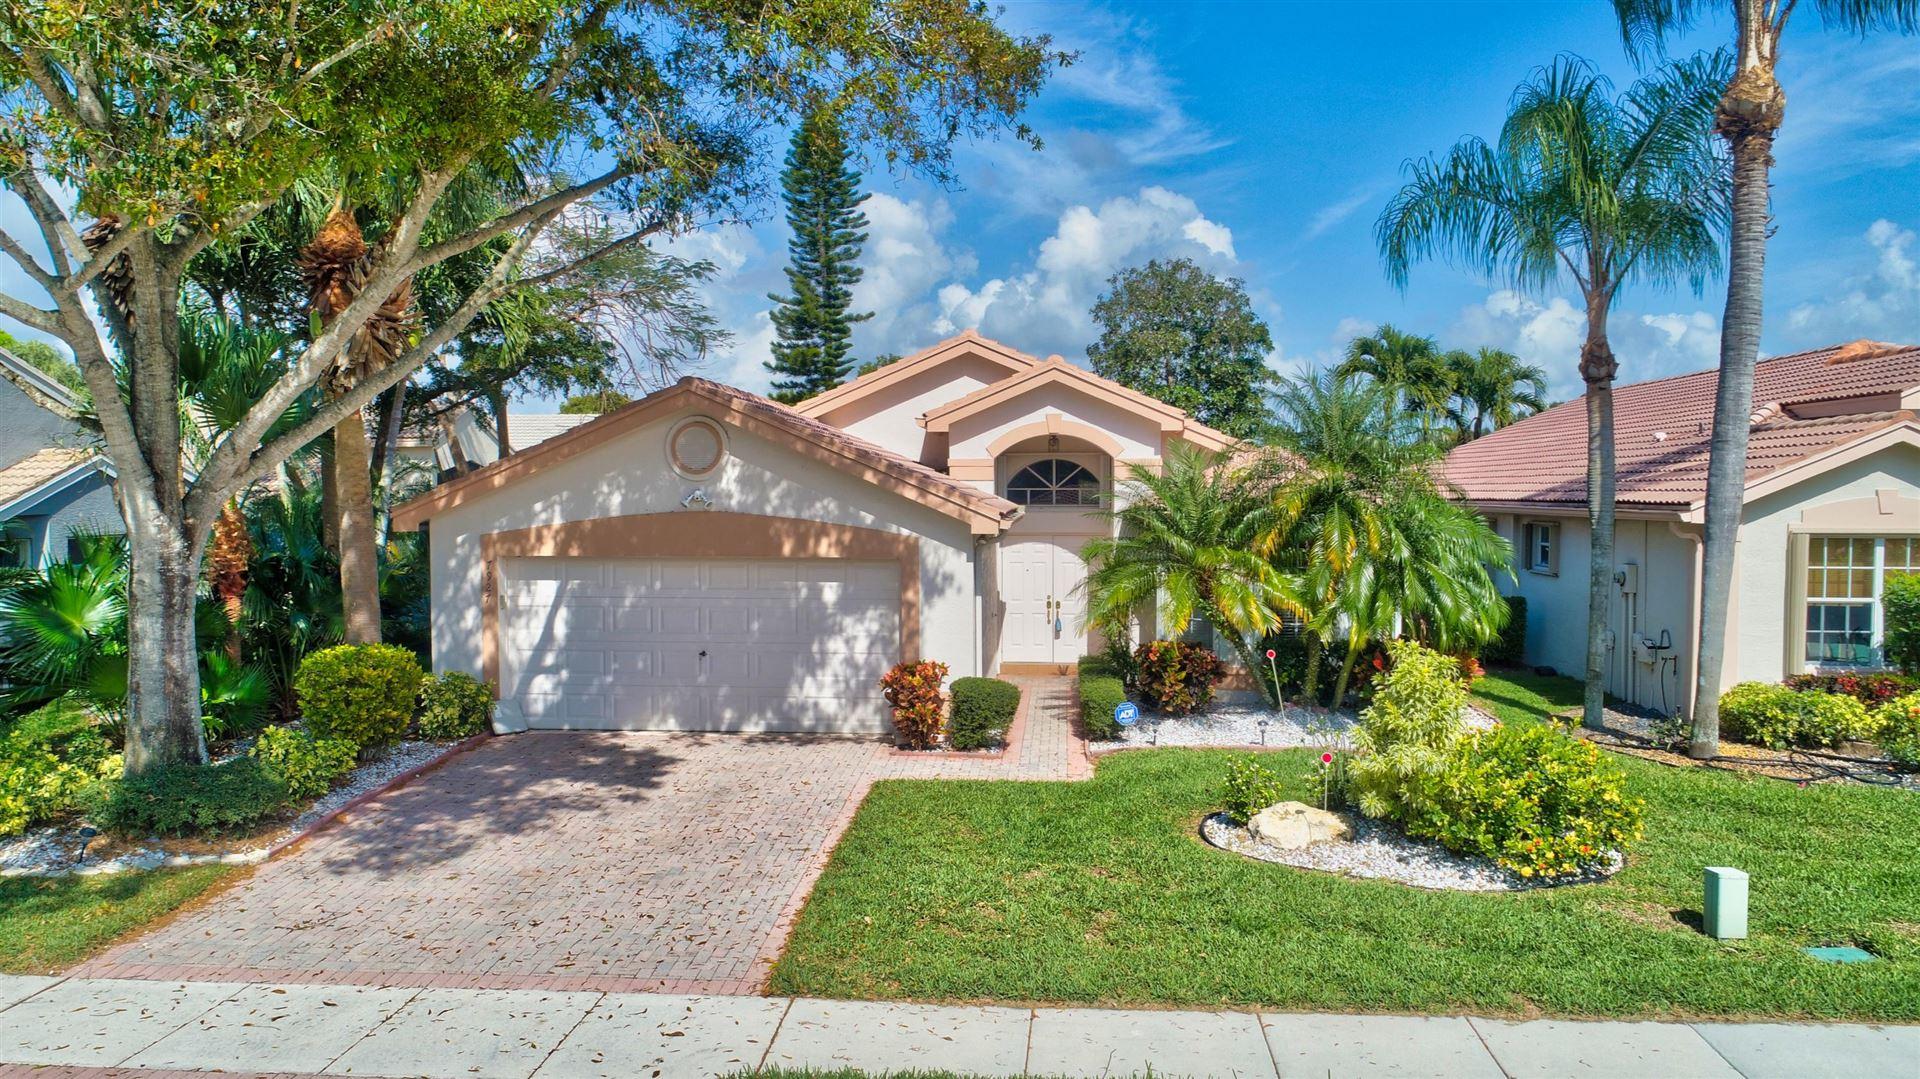 7927 Samara Street, Boynton Beach, FL 33437 - #: RX-10631366